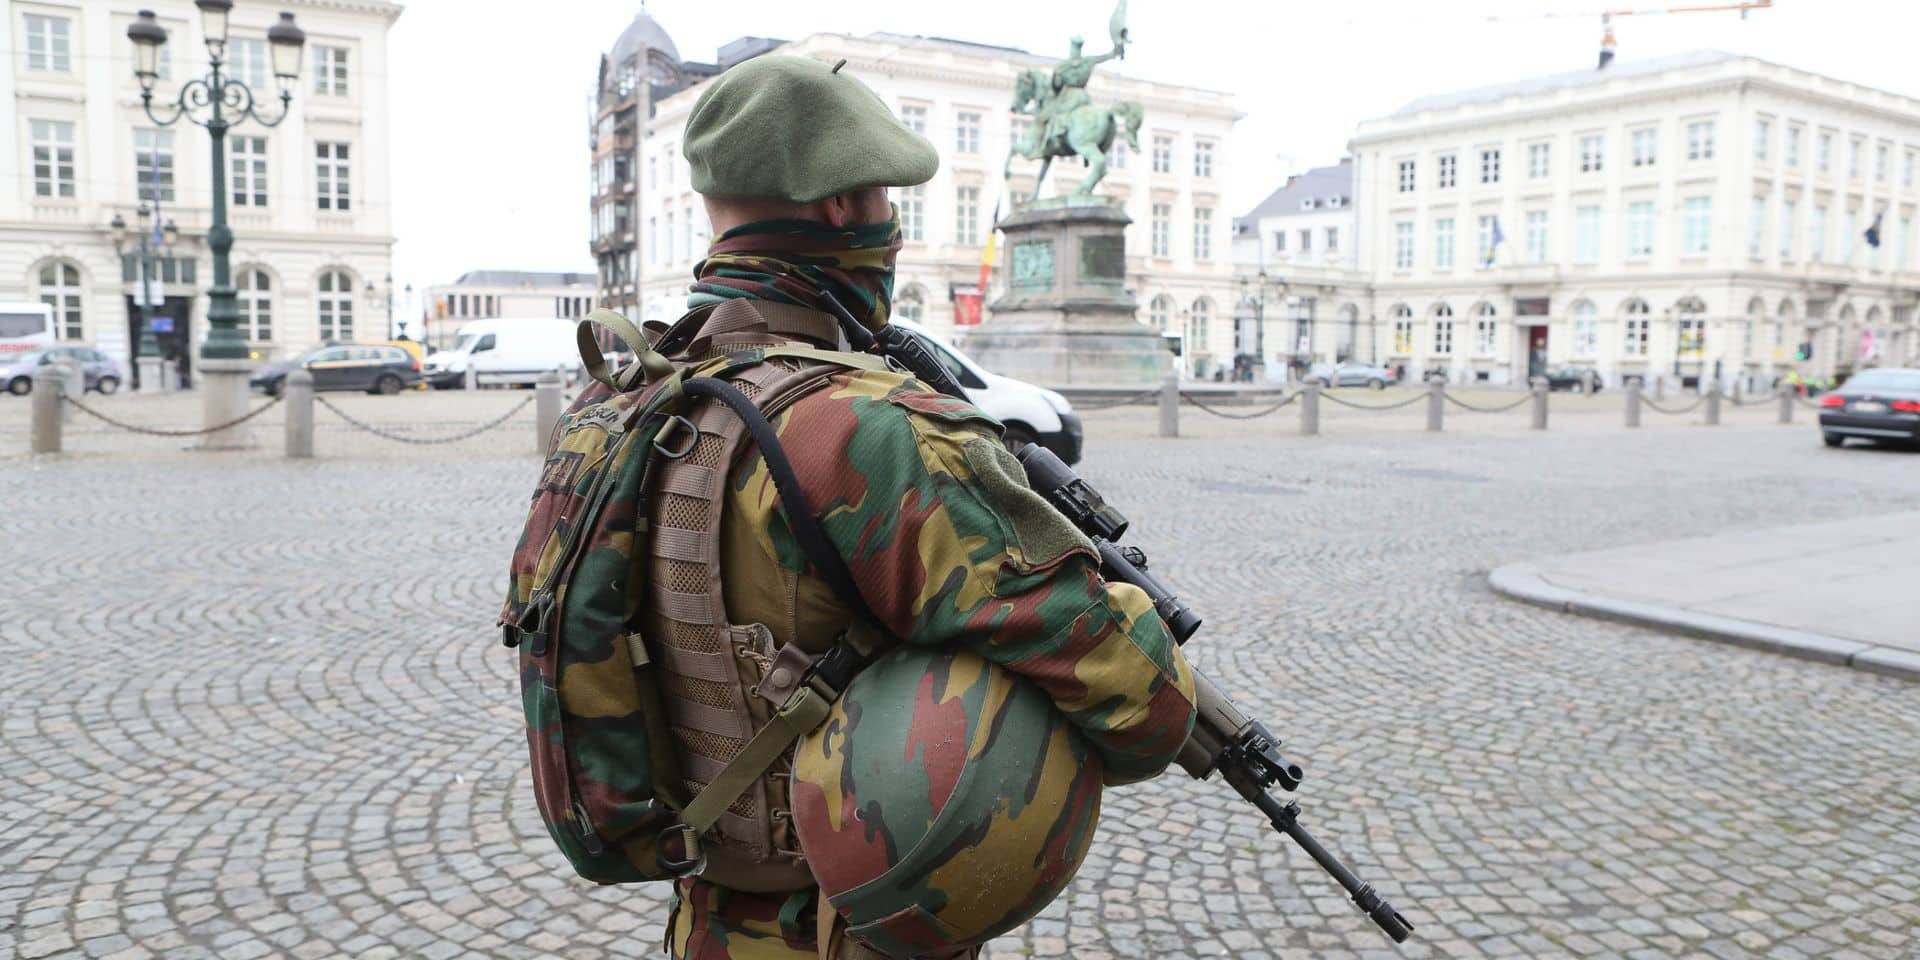 Les militaires maintenus en rue jusqu'au 2 octobre